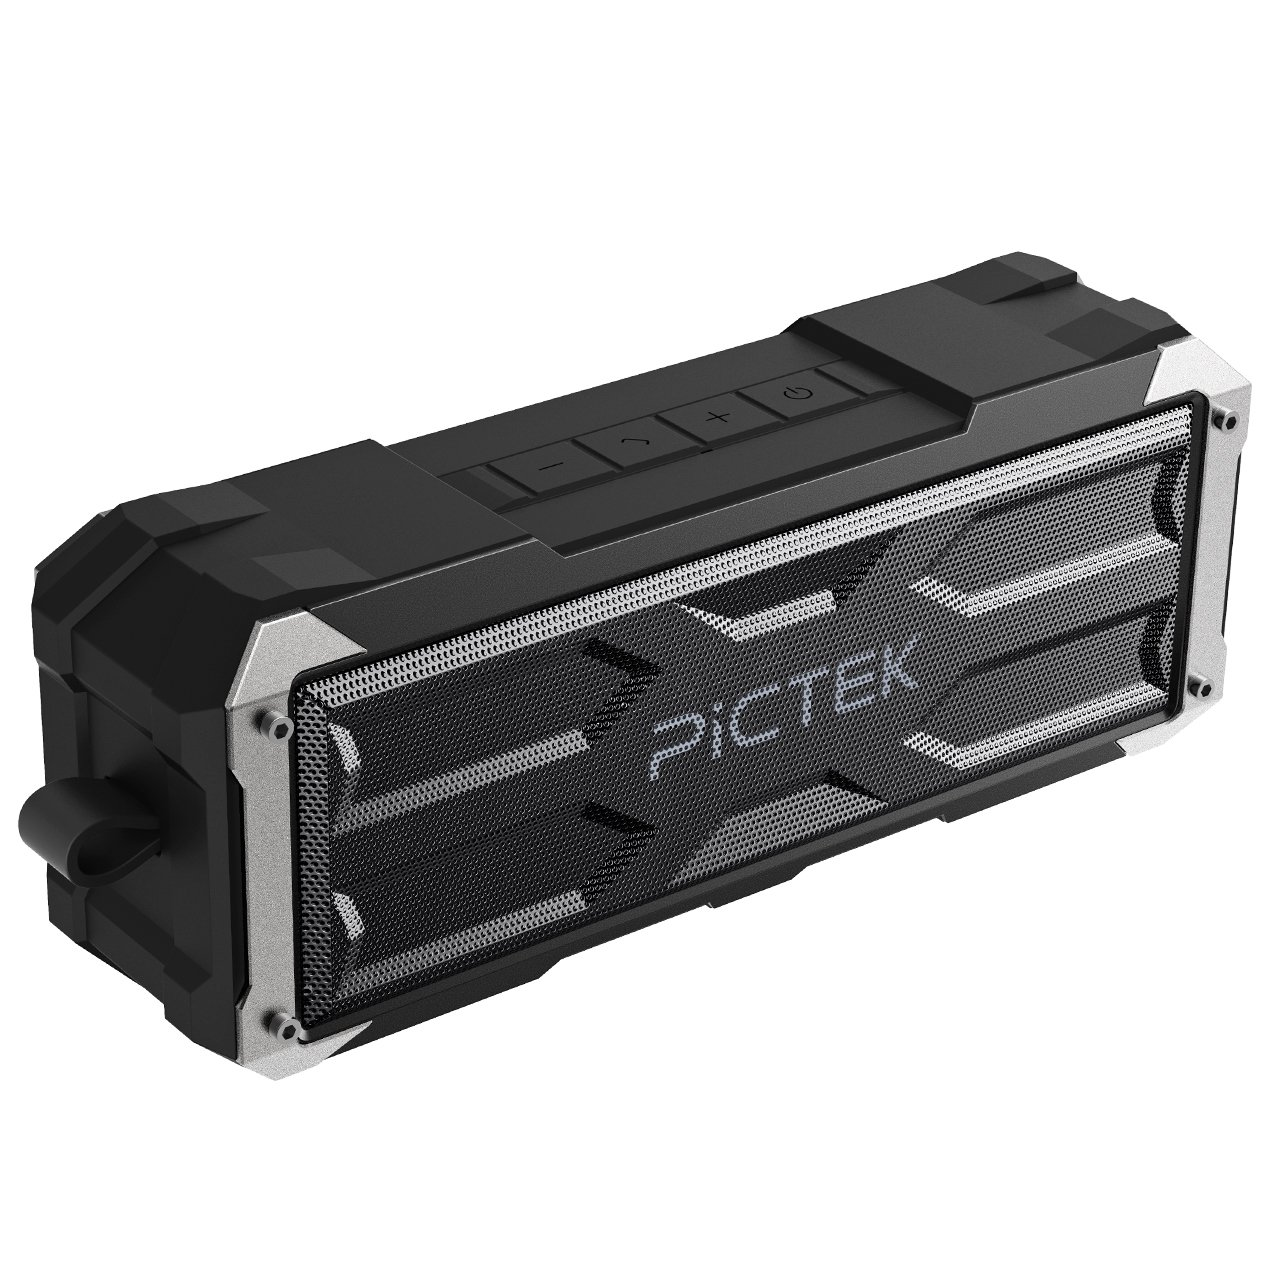 Pictek Bluetooth Speakers Bomber 20W Portable Stereo